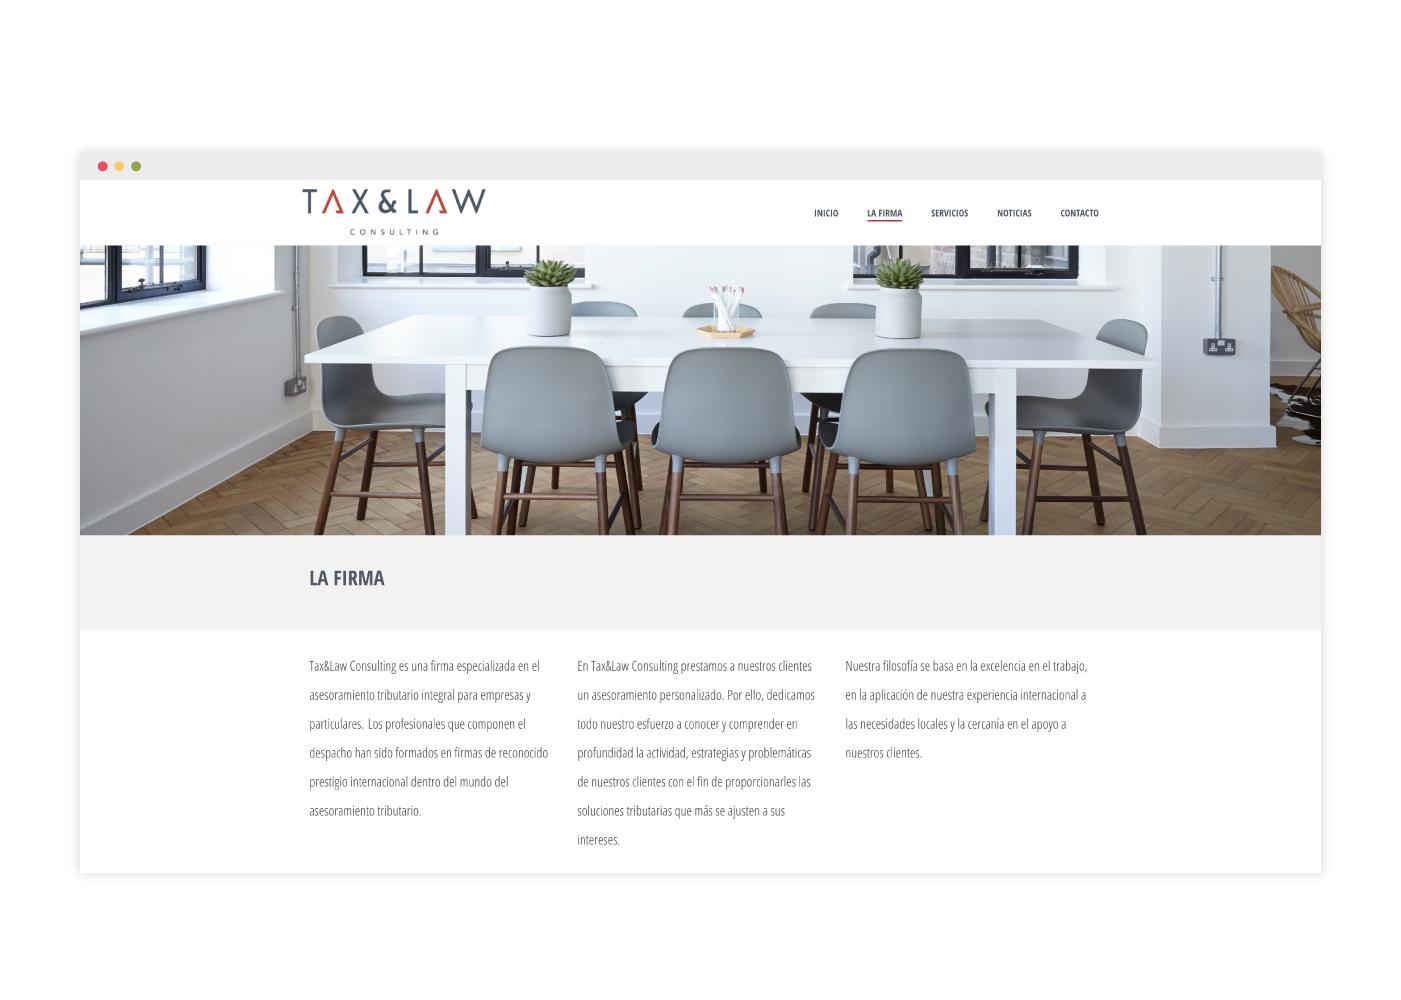 diseno-programacion-web-abogados-malaga-tax-law-5